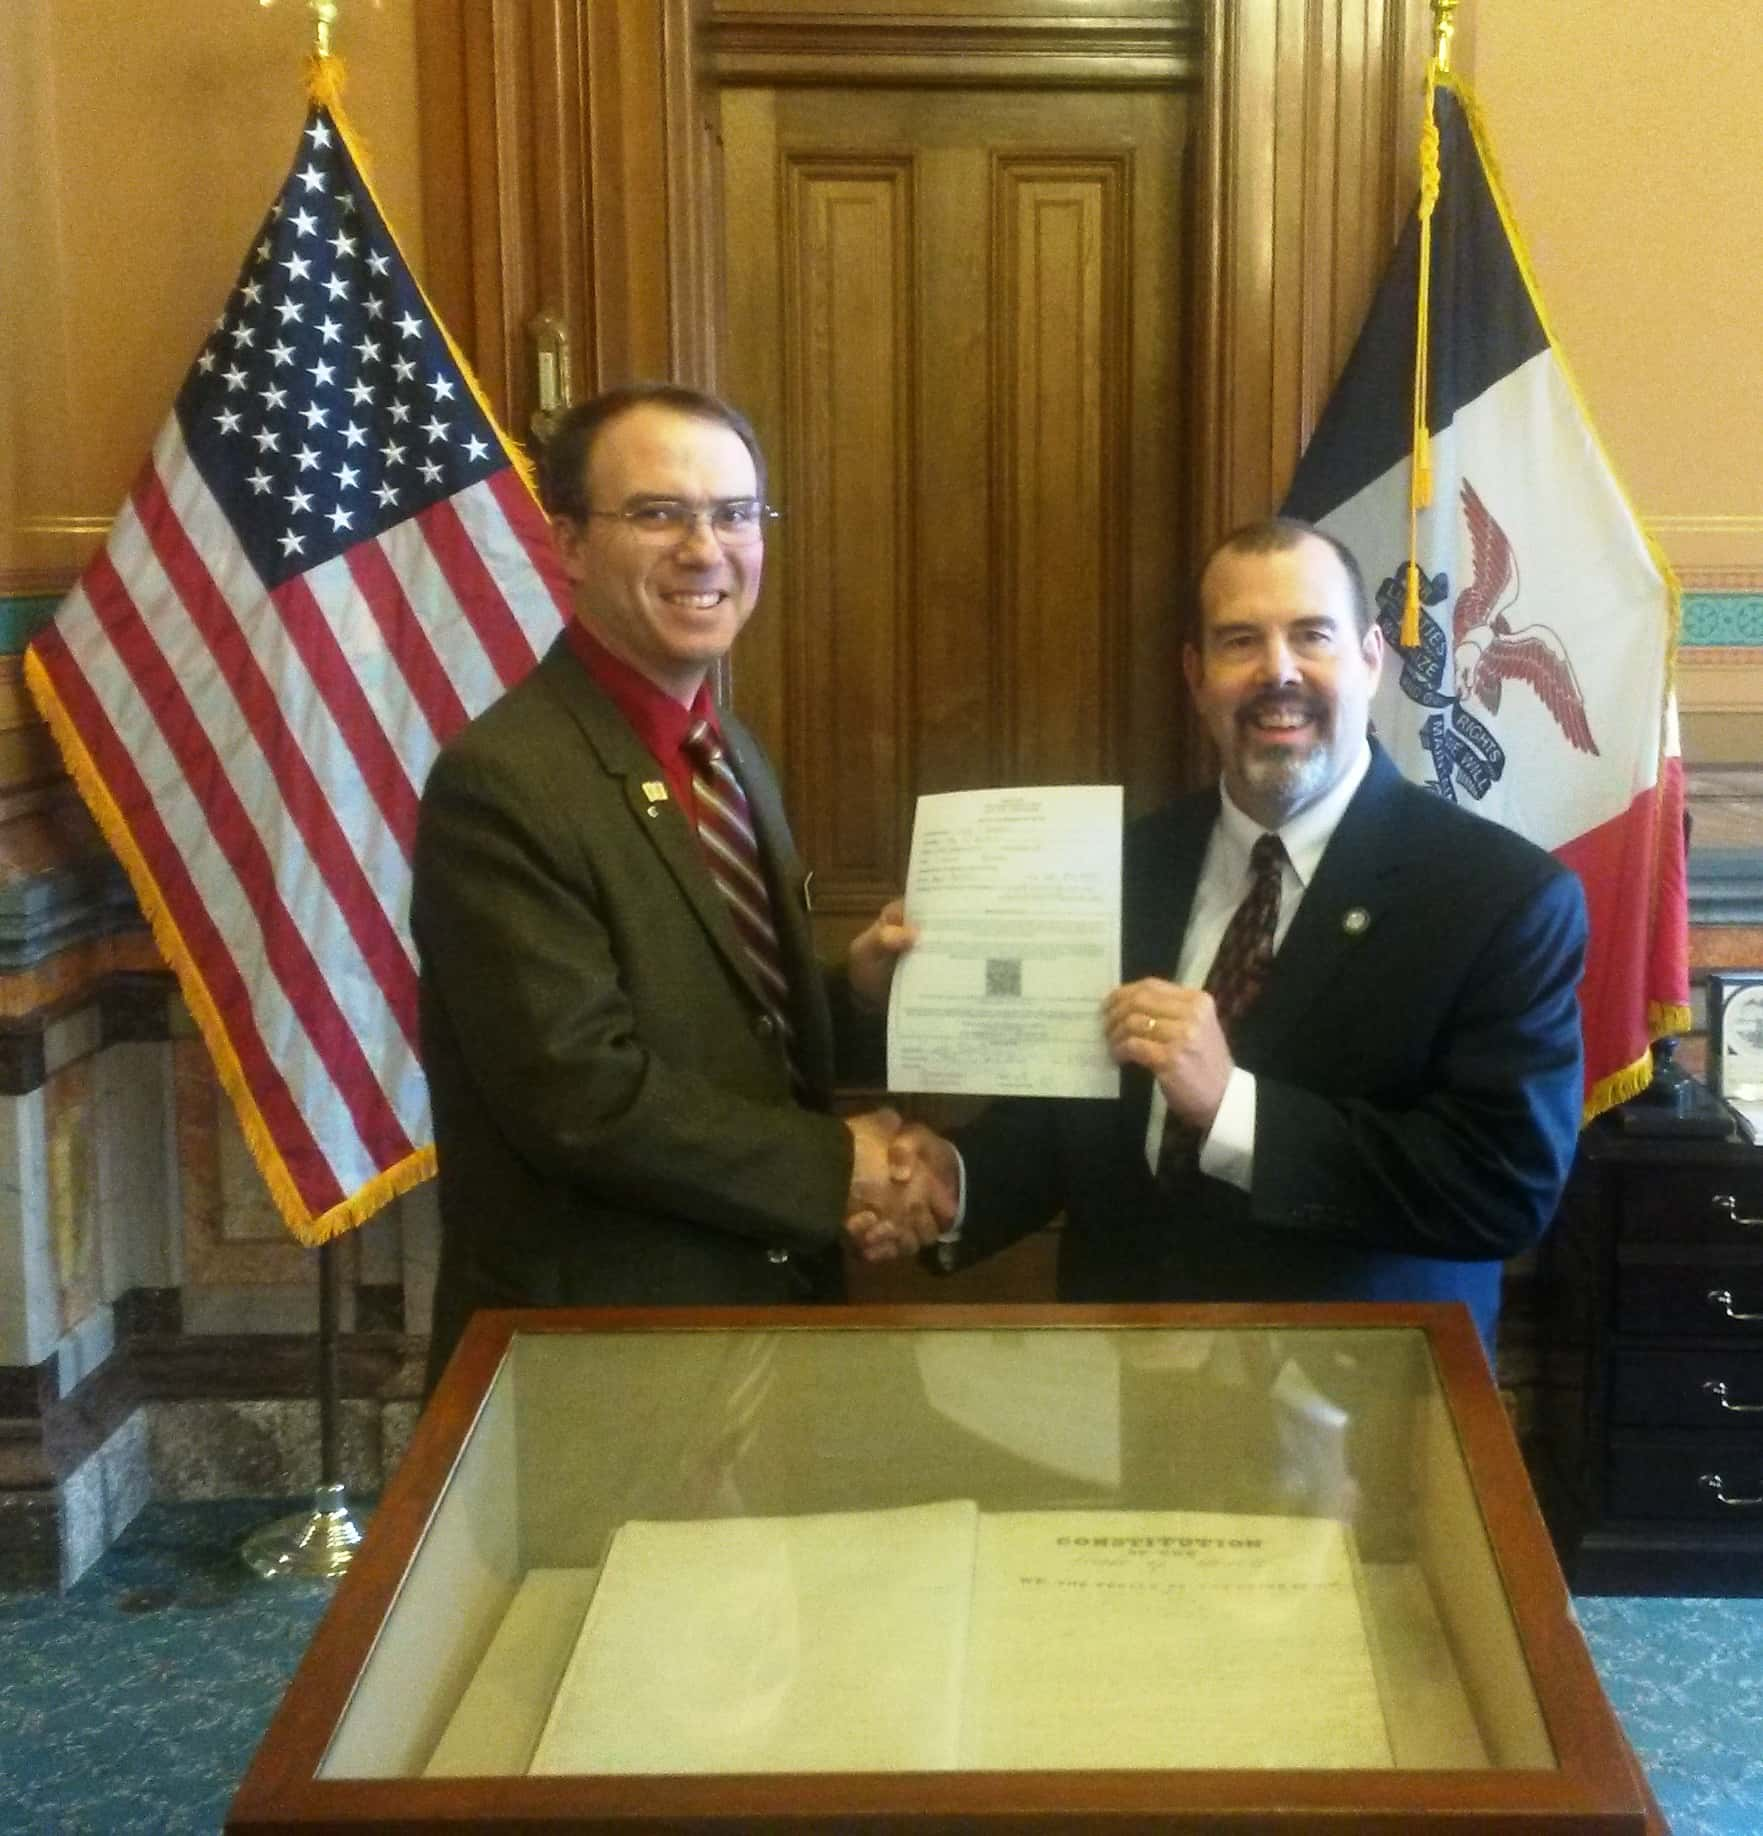 Representative Heartsill  handing his Affidavit of Candidacy paperwork to Deputy Secretary of State Michael Ross.